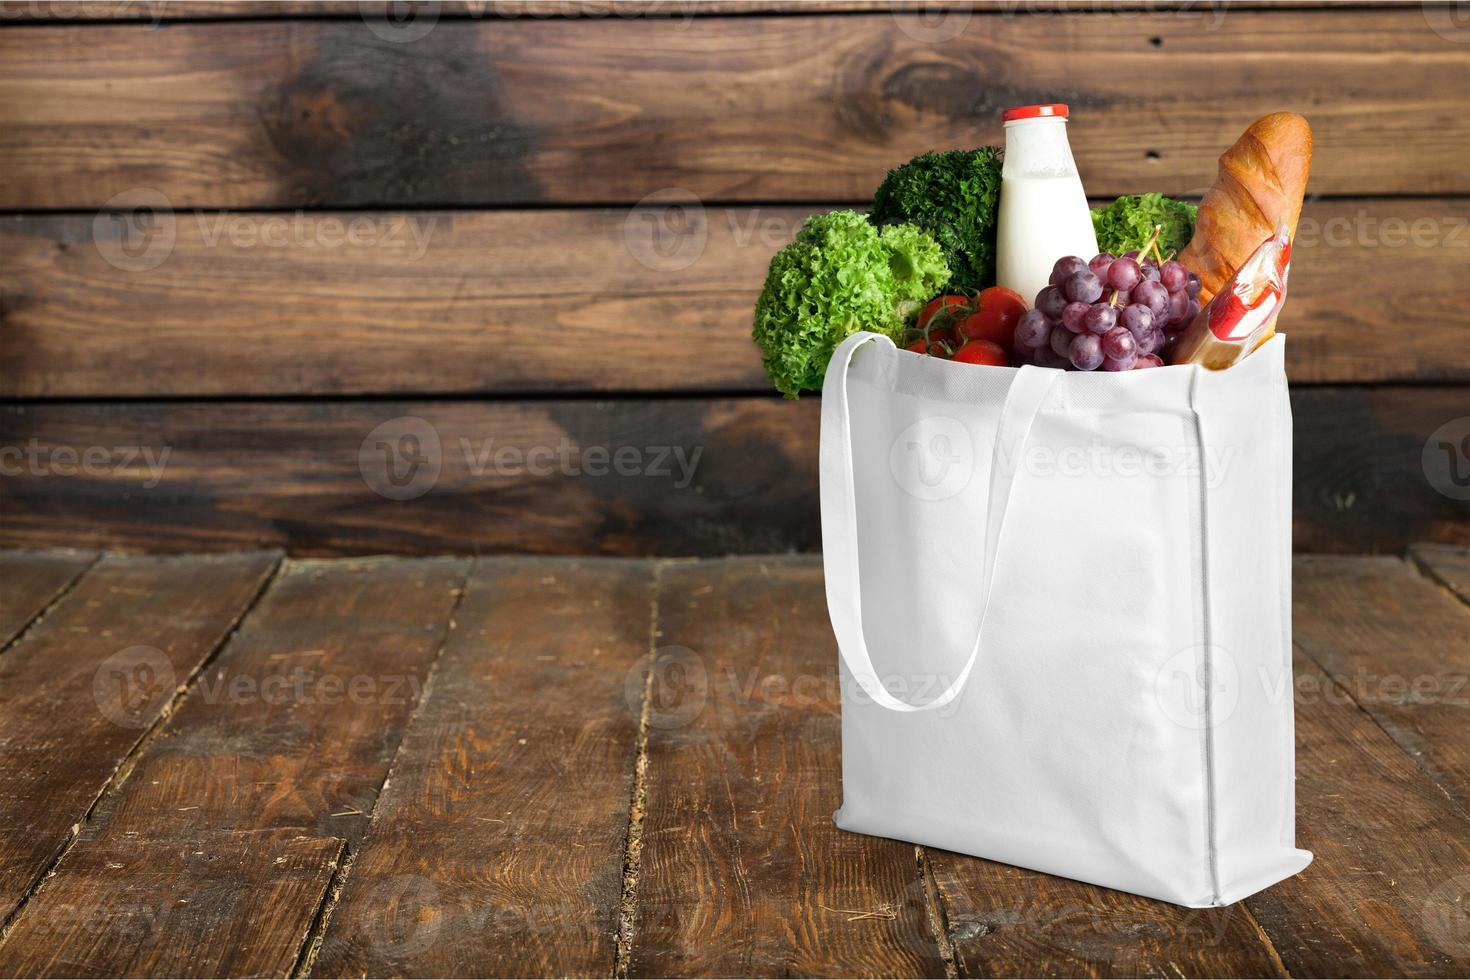 Bag, Shopping Bag, Groceries photo